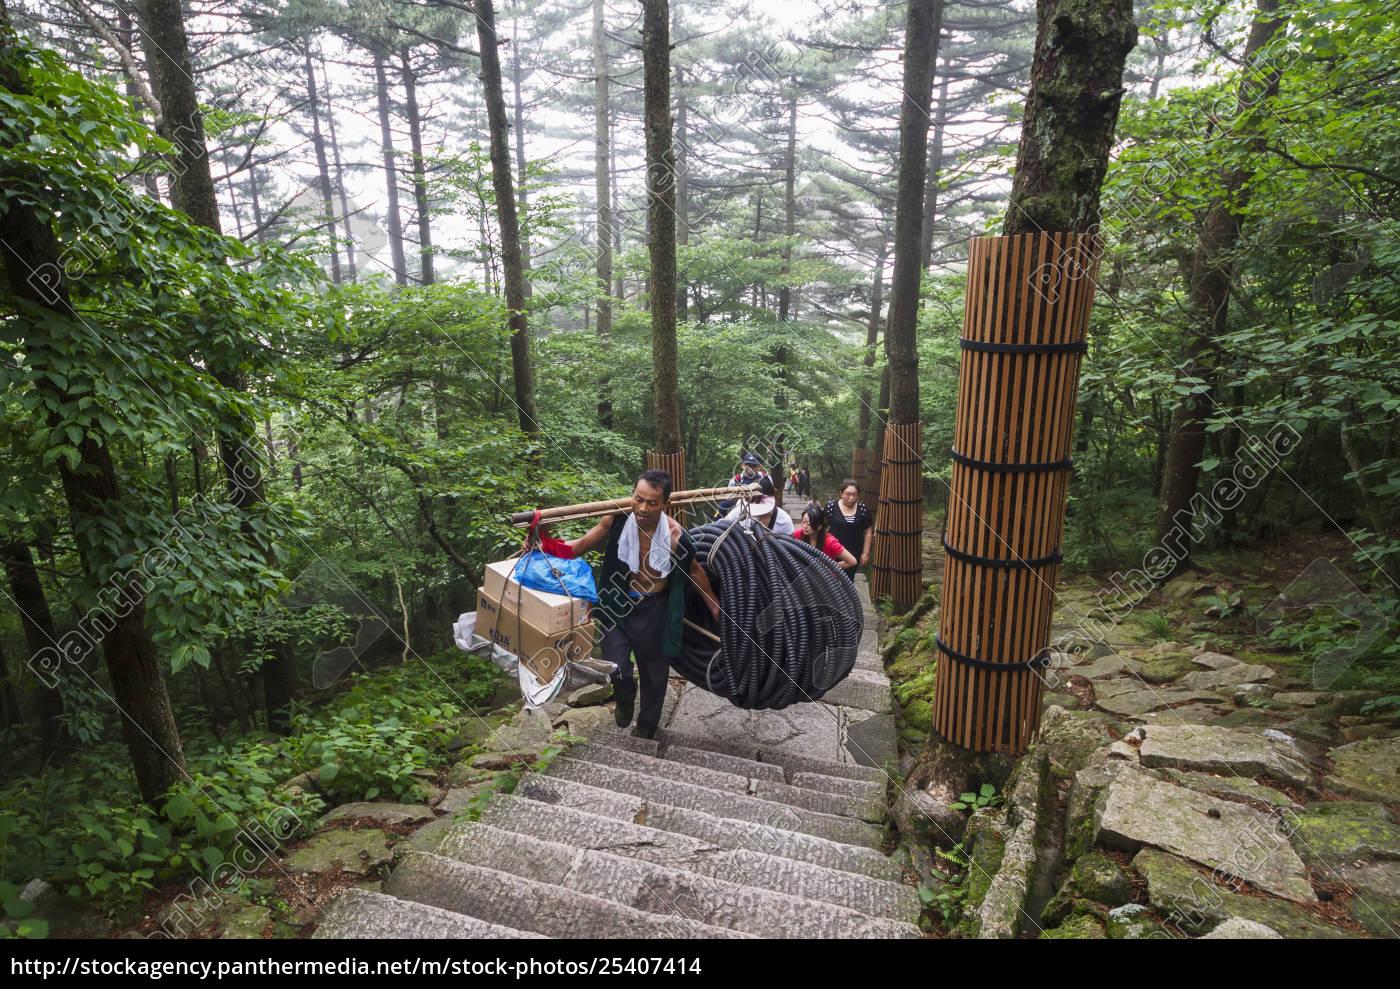 porter, carrying, items, mount, huangshan, anhui, china - 25407414